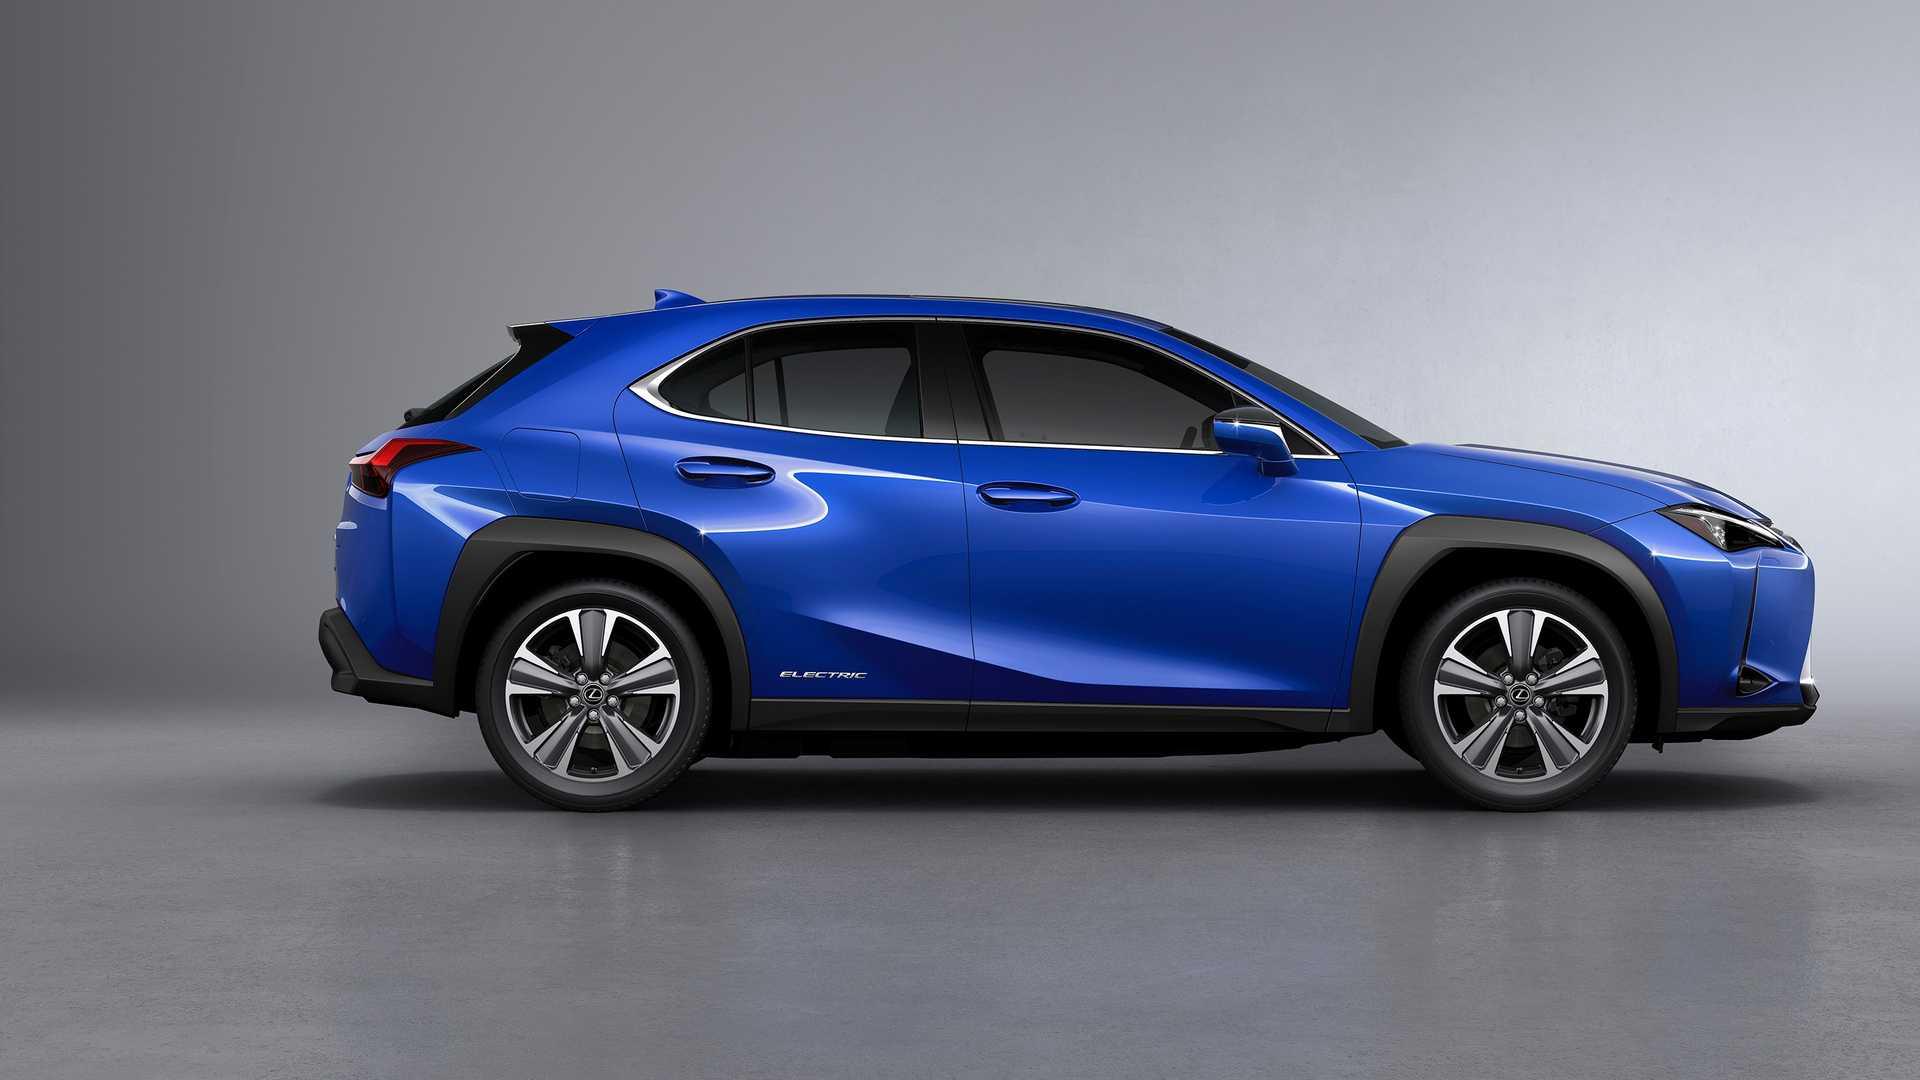 Lexus Unveiled Its First Electric Car: Lexus 300e UX